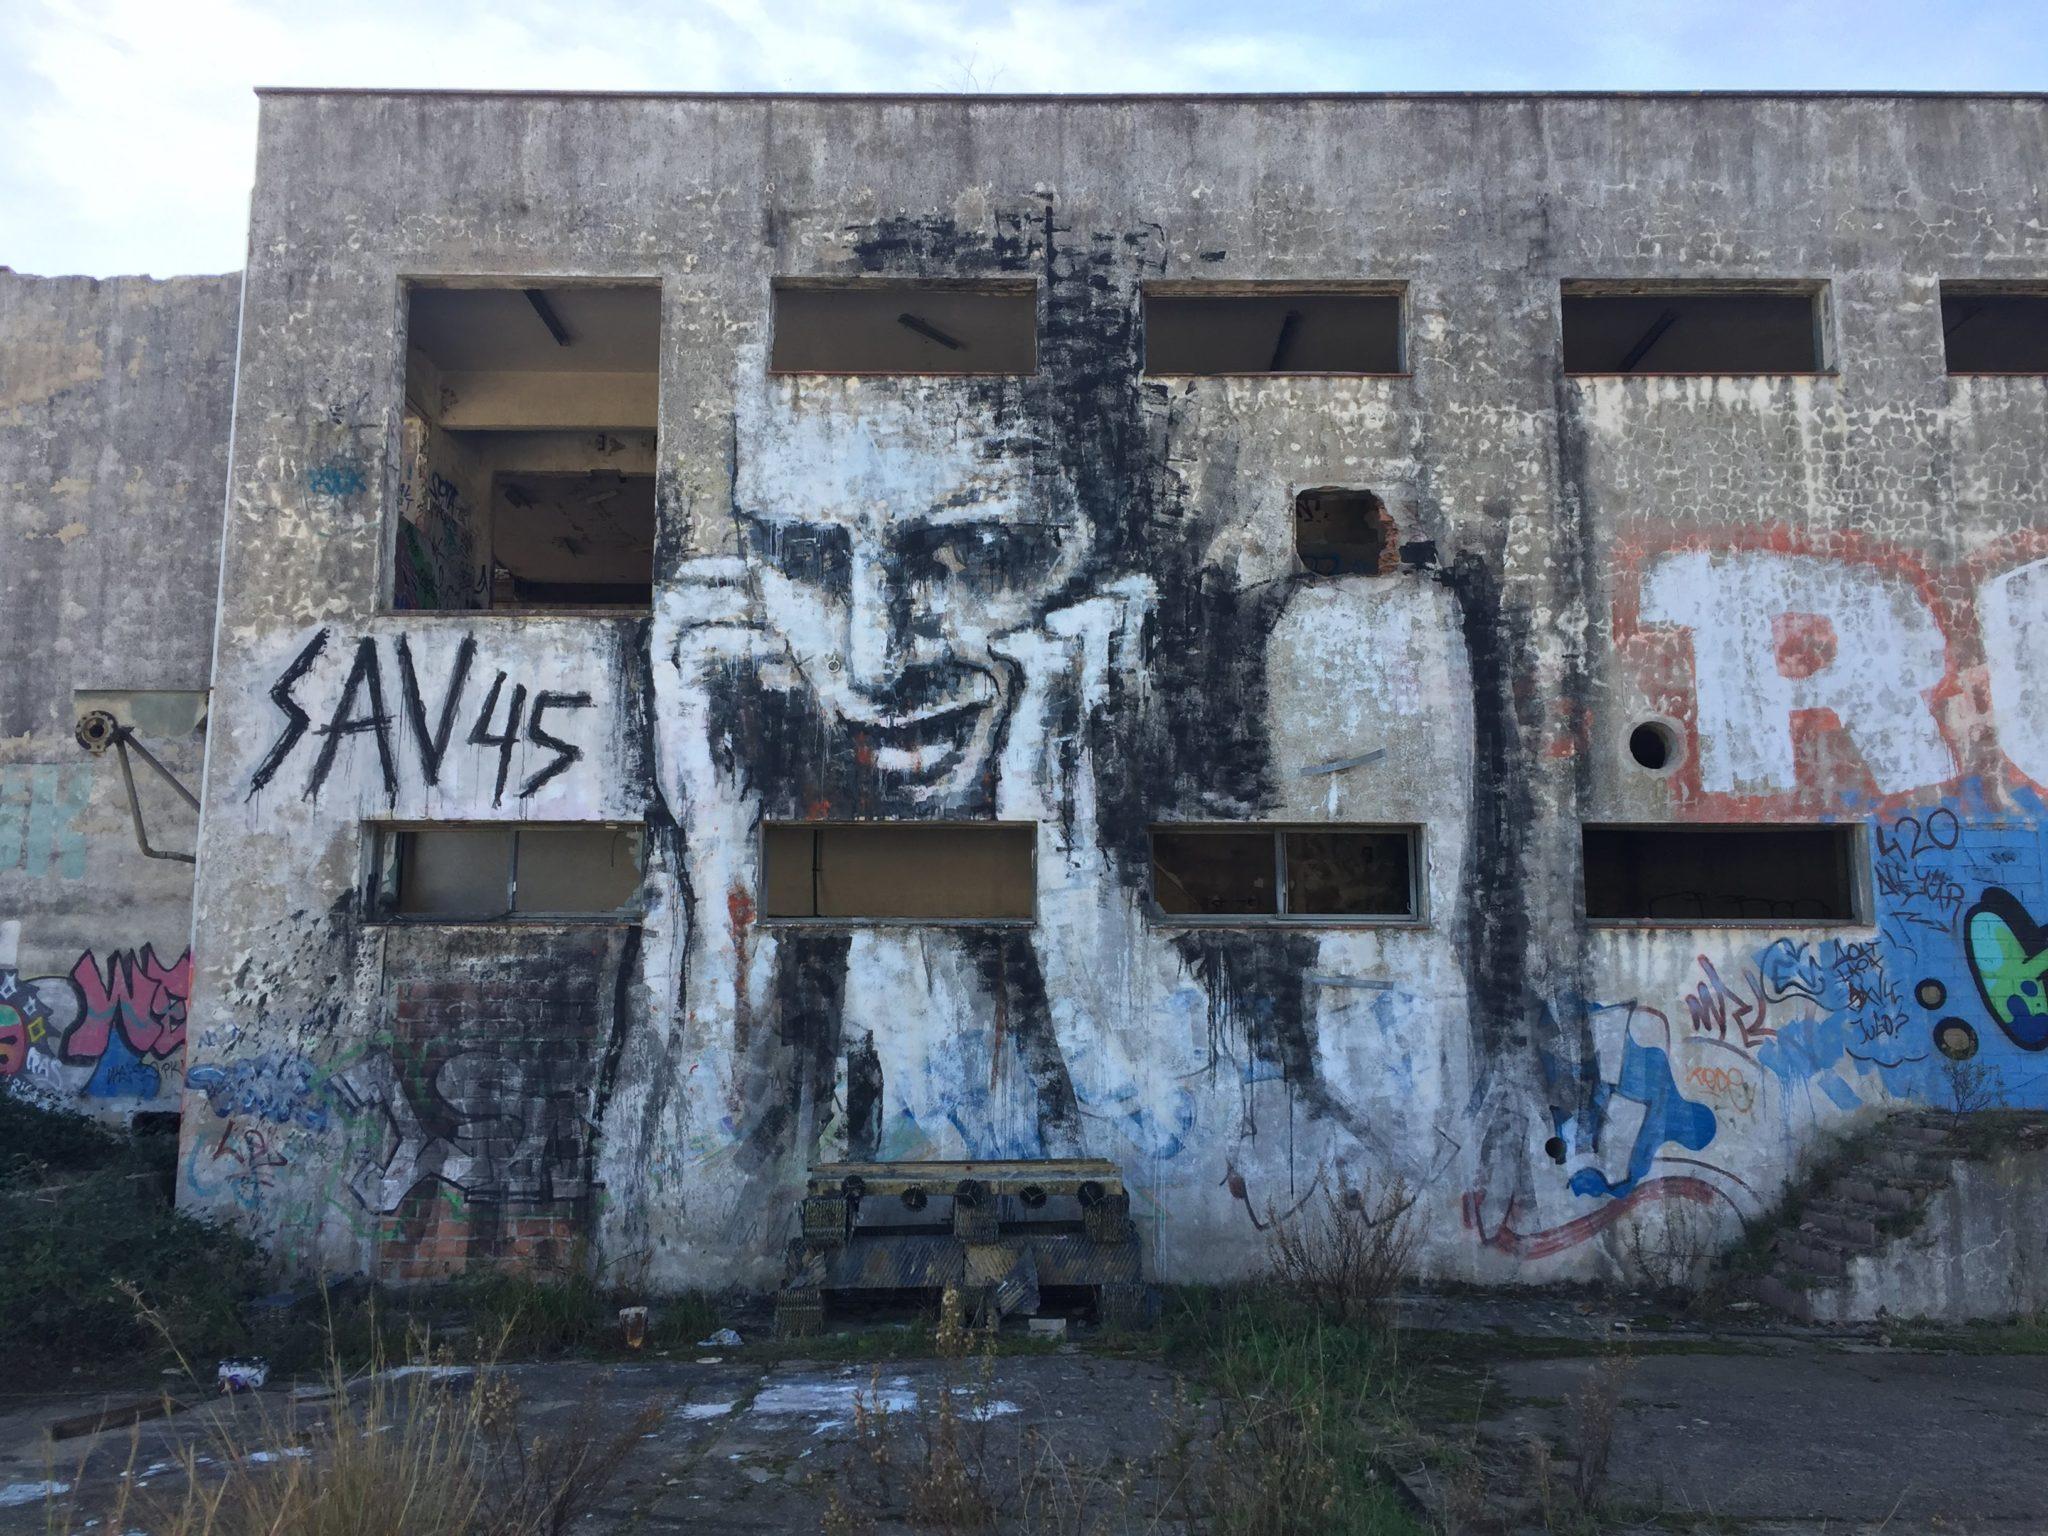 SAV45 street art